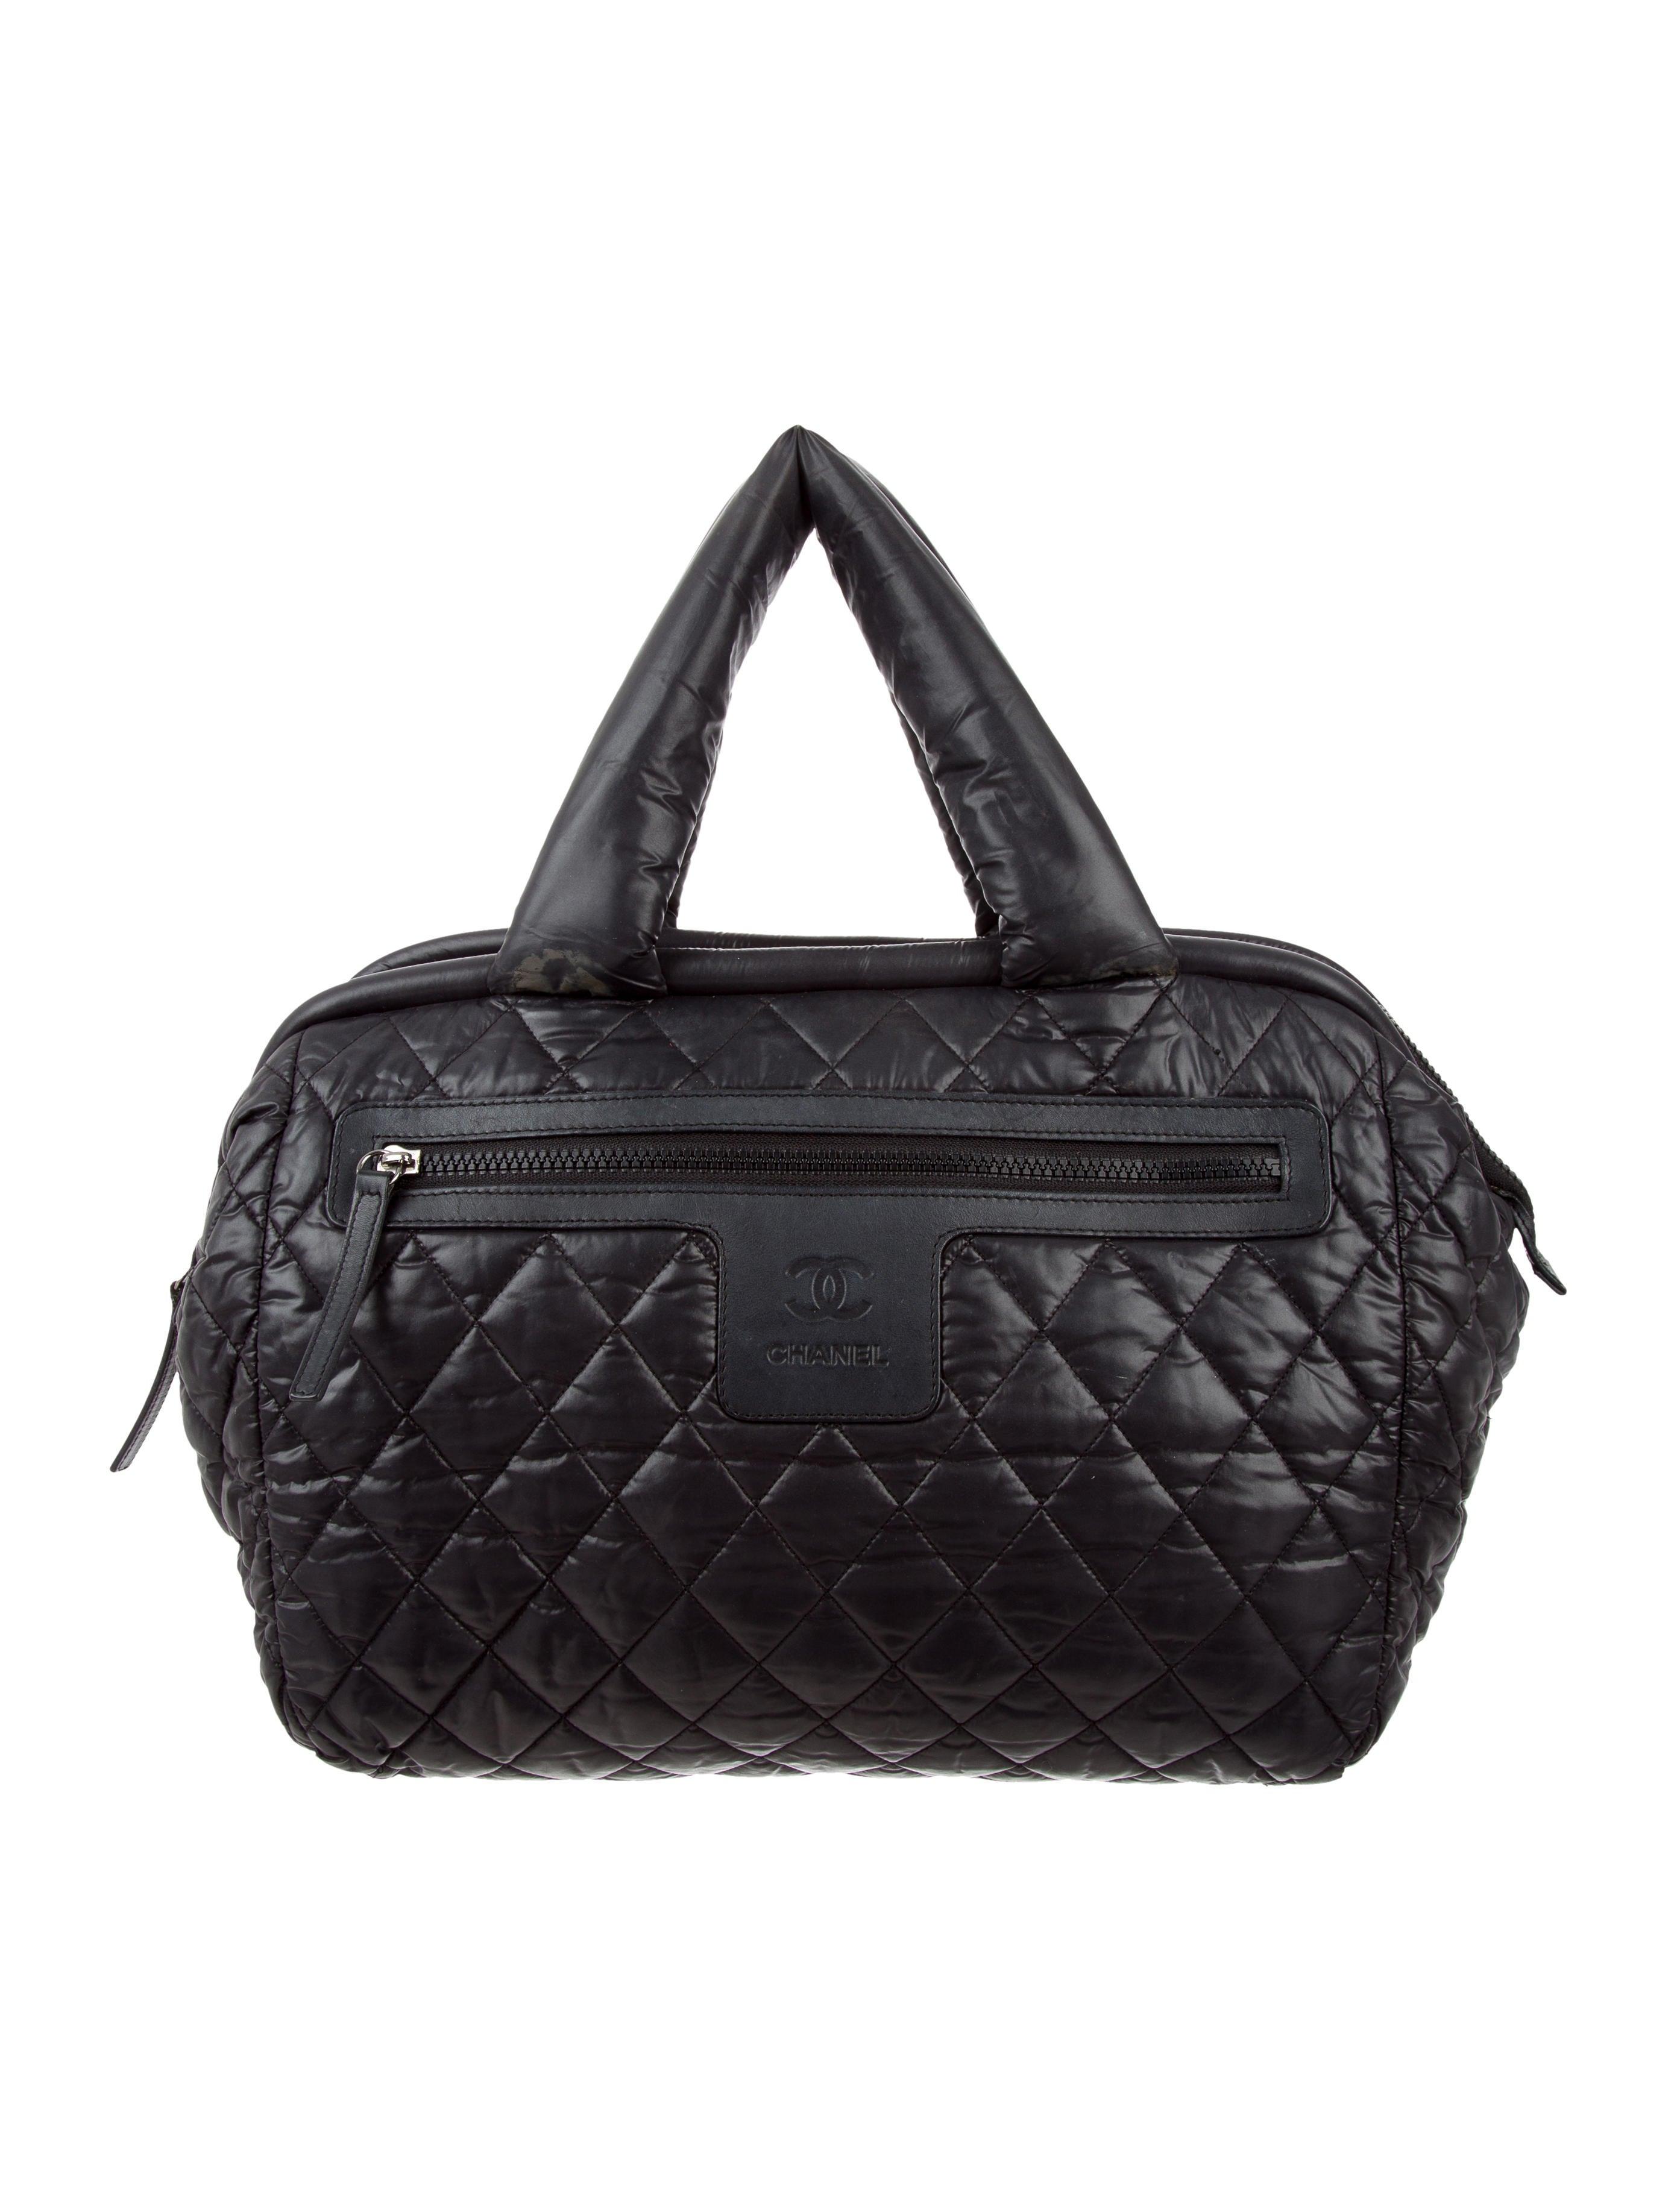 Chanel Coco Cocoon Bowler Bag - Handbags - CHA196779 | The ...